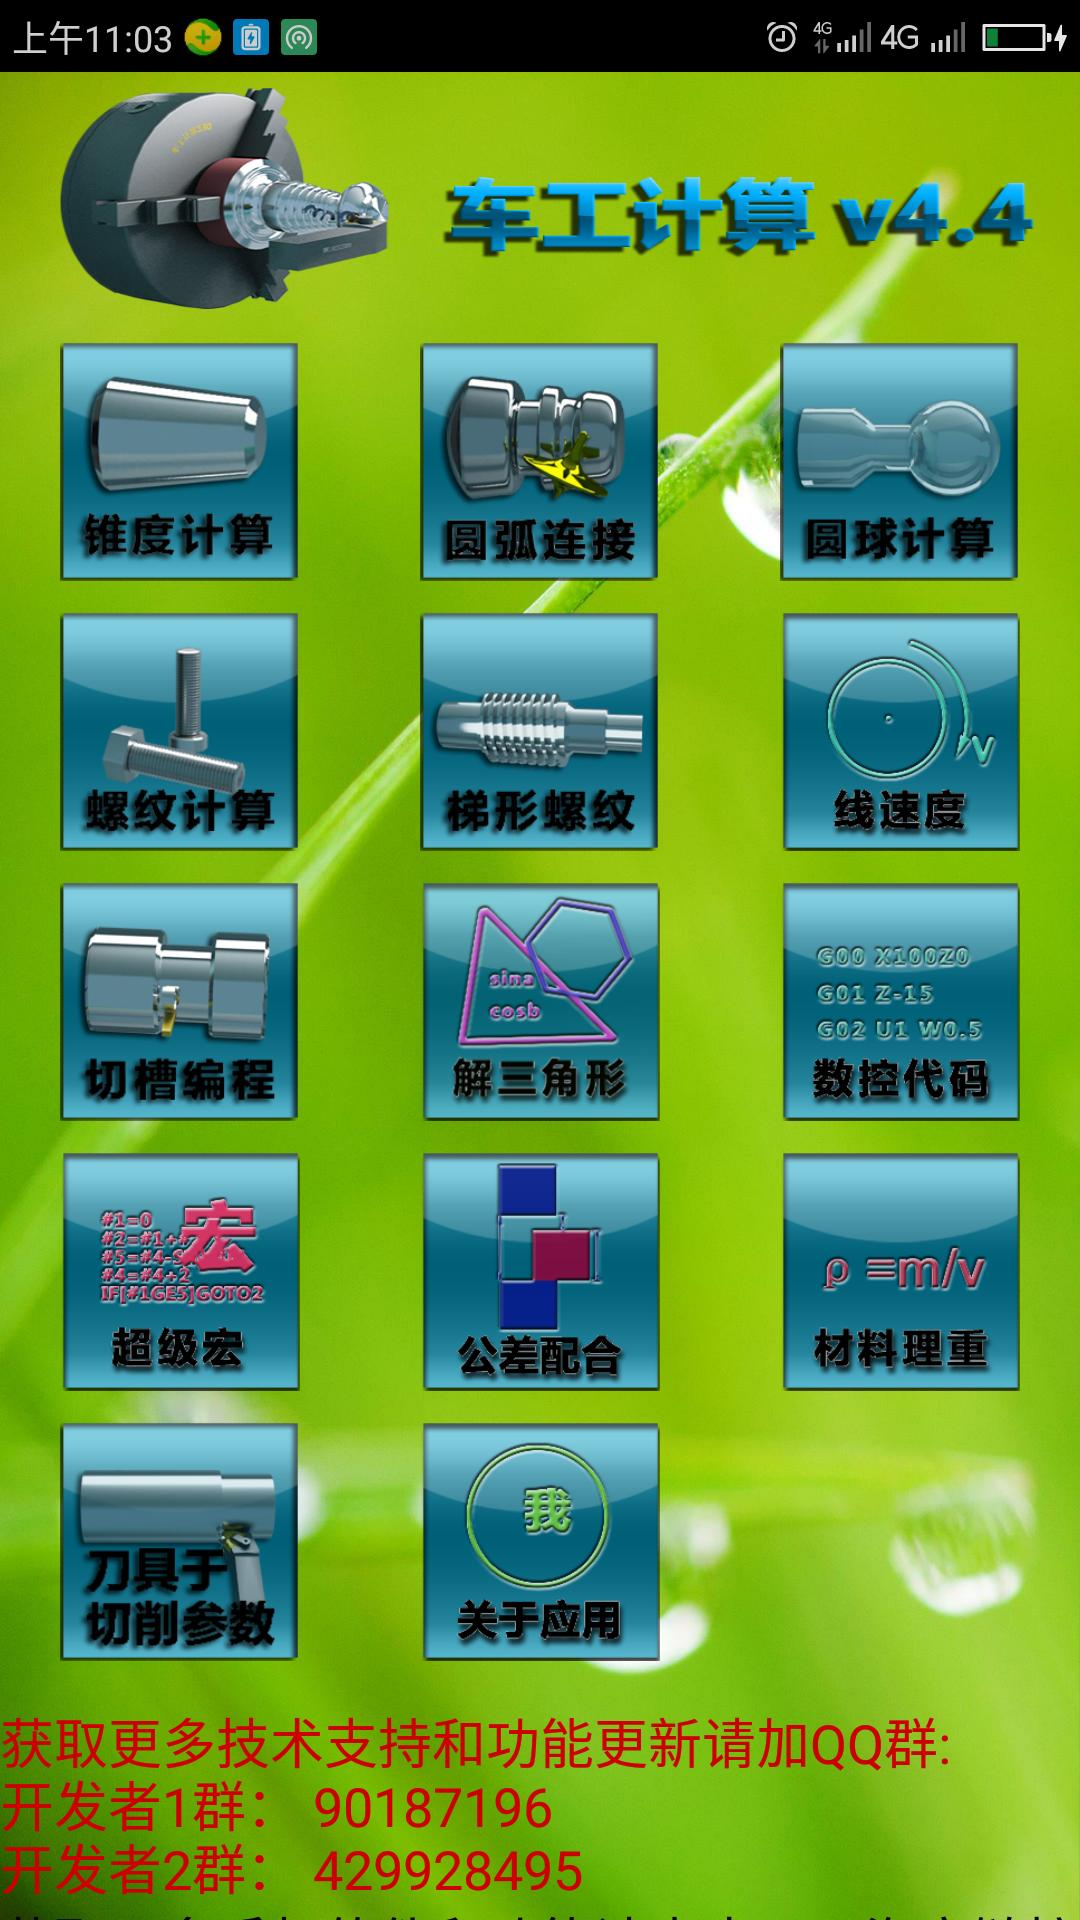 Turner calculation 6 4 CNC car Android mobile phone programming software  macro program programming app